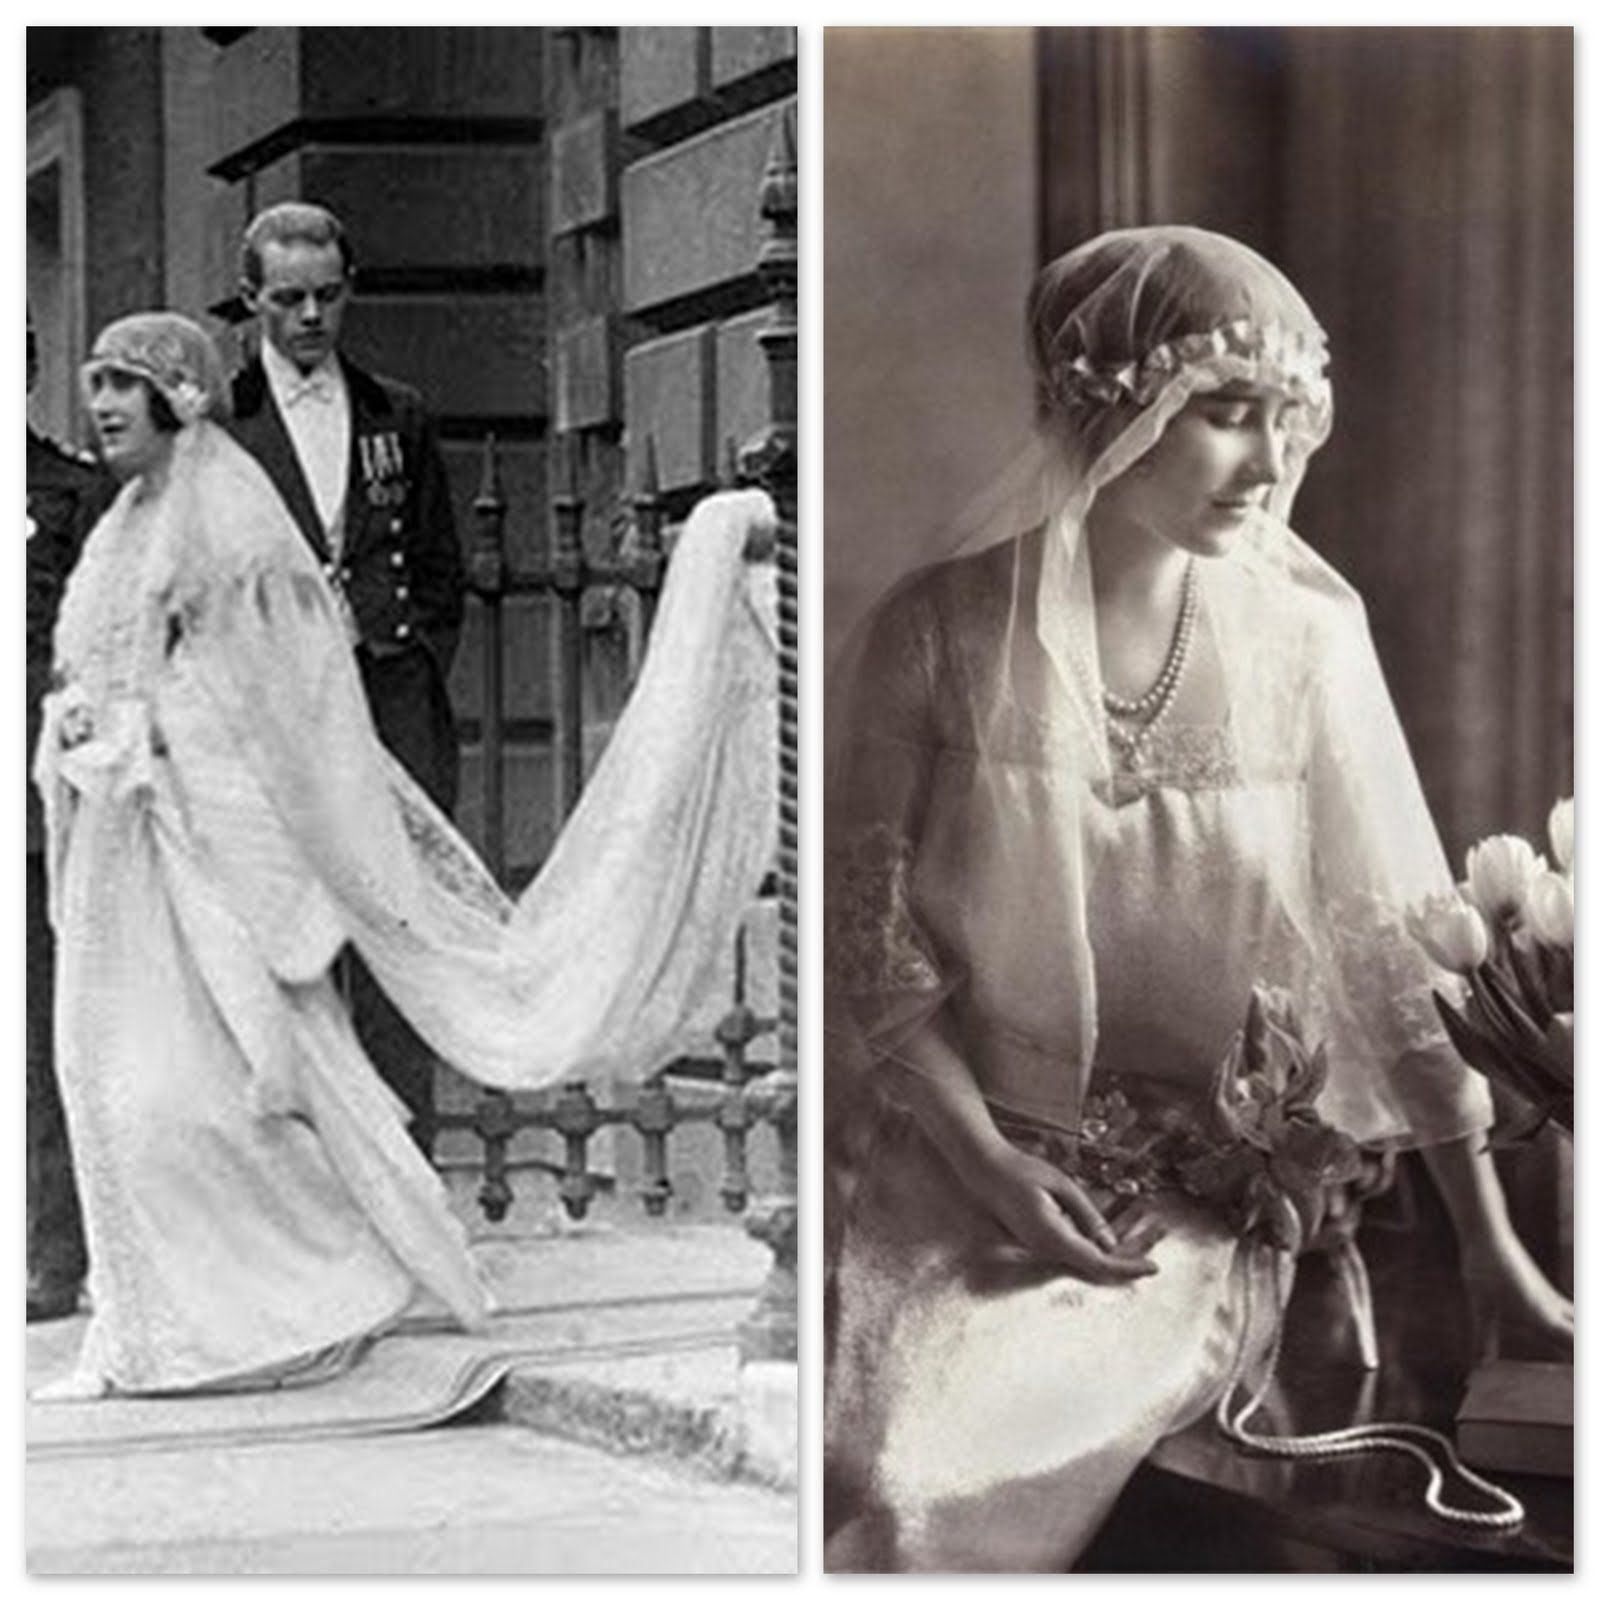 Elizabeth Angela Marguerite Bowes Lyon In 1923 She Married Albert Duke Of York The Second Son Of King George Royal Wedding Dress Queen Mother Vintage Bride